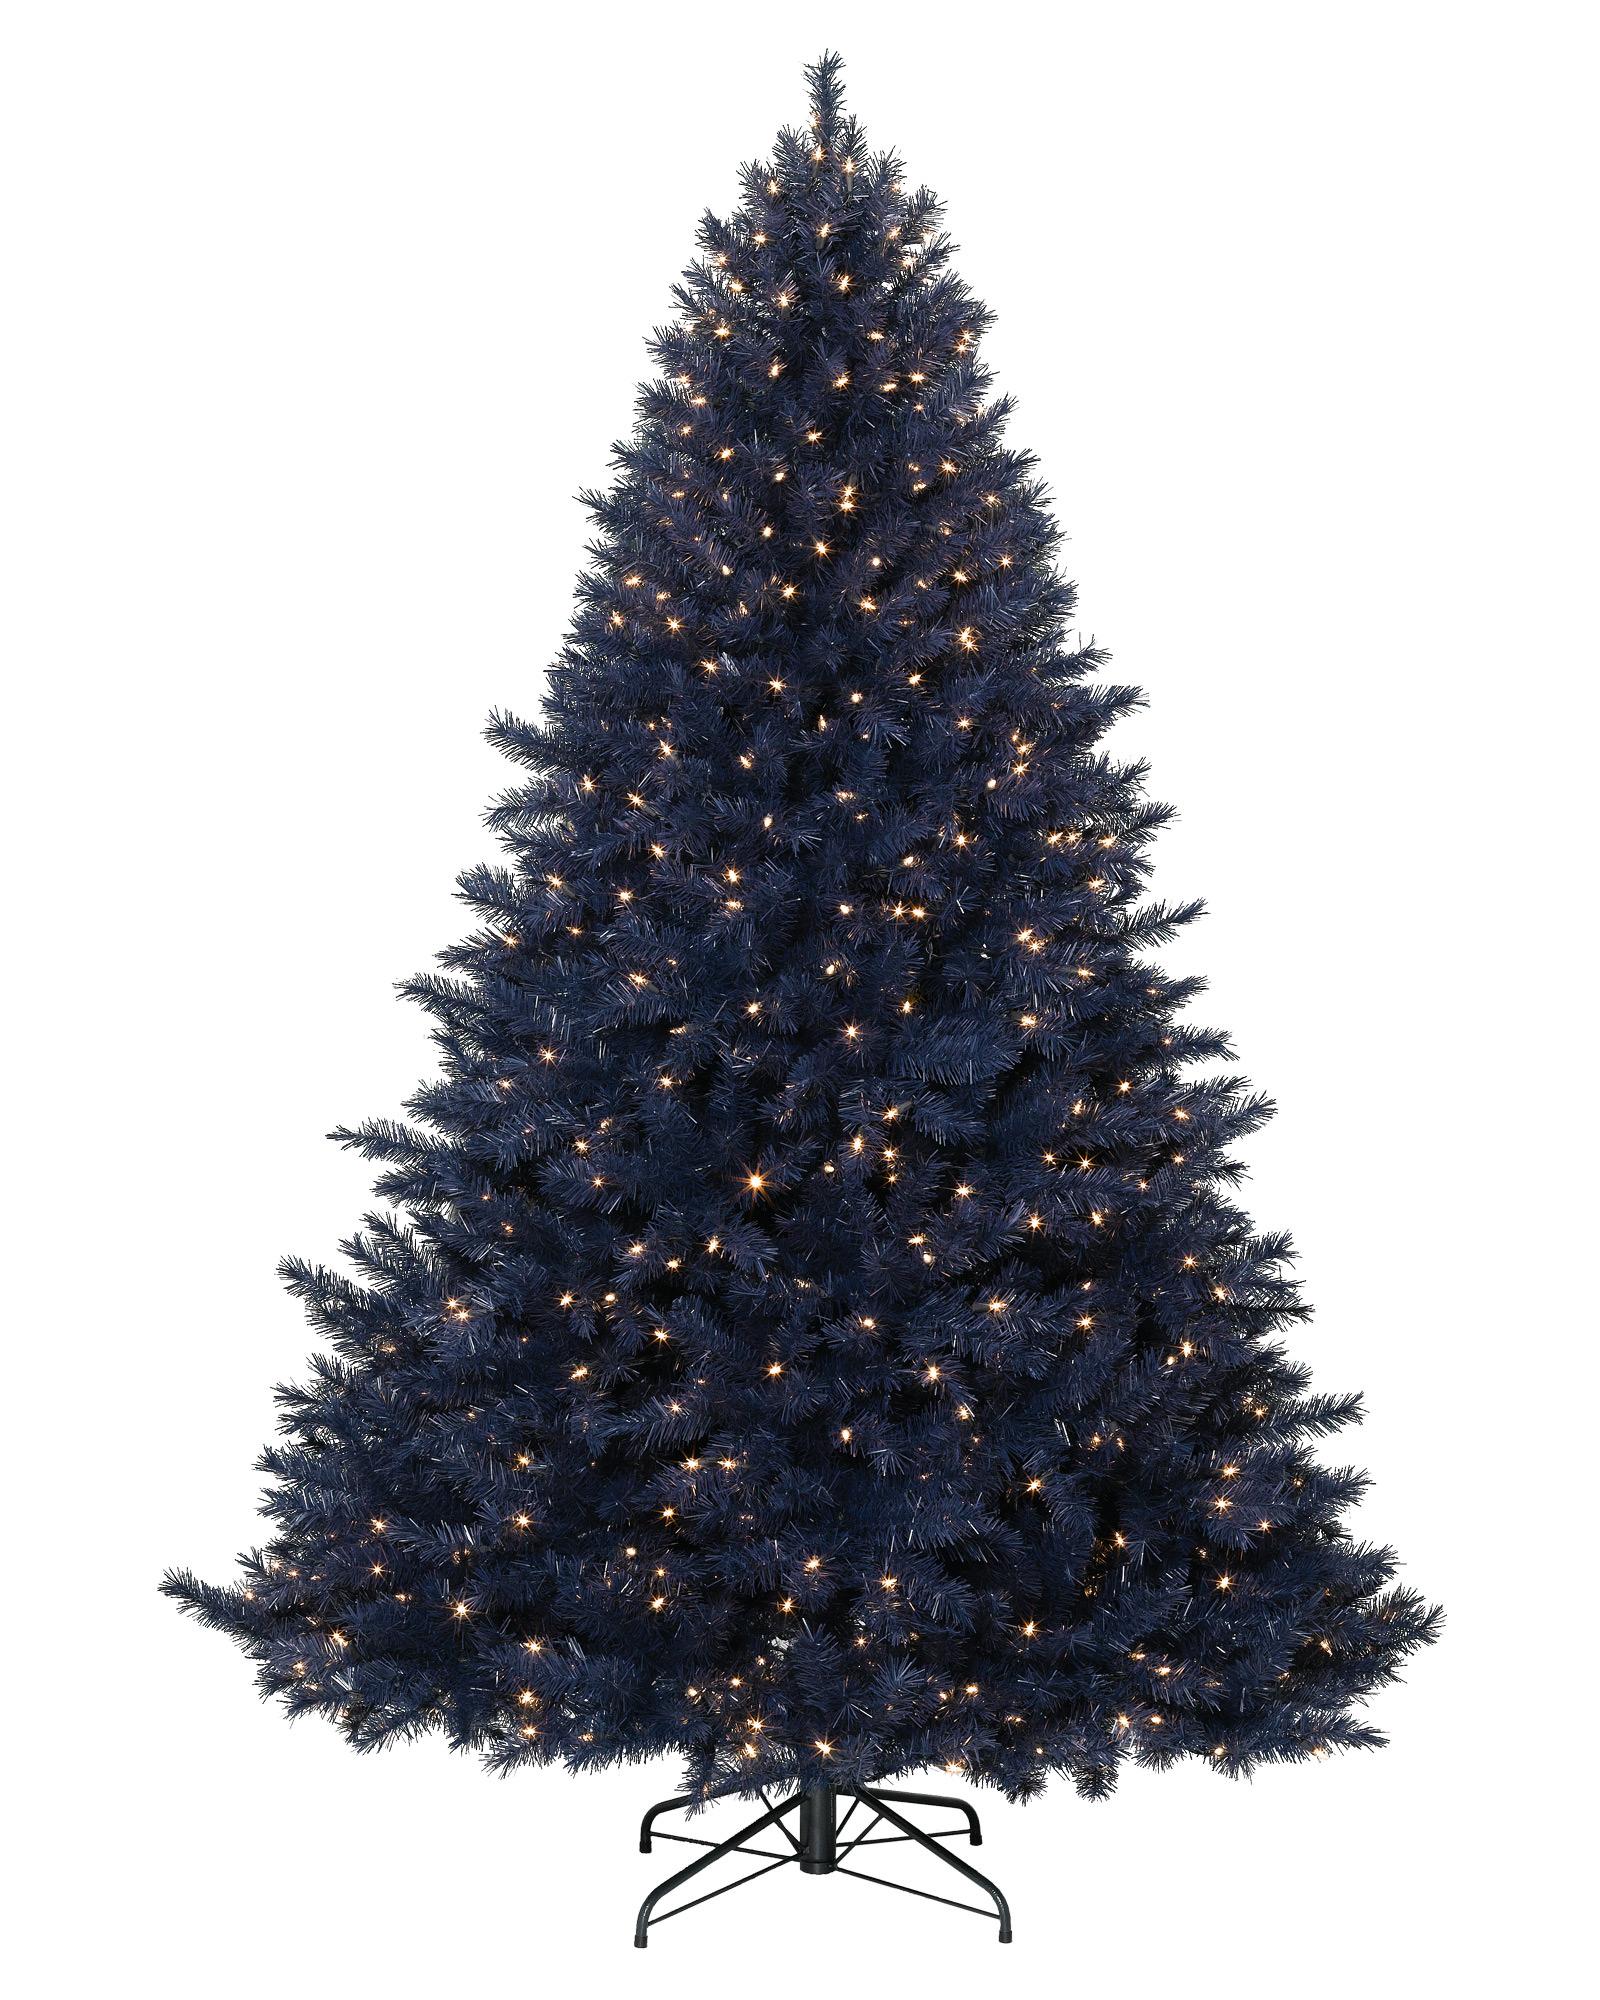 Navy Blue Artificial Christmas Tree | Treetopia